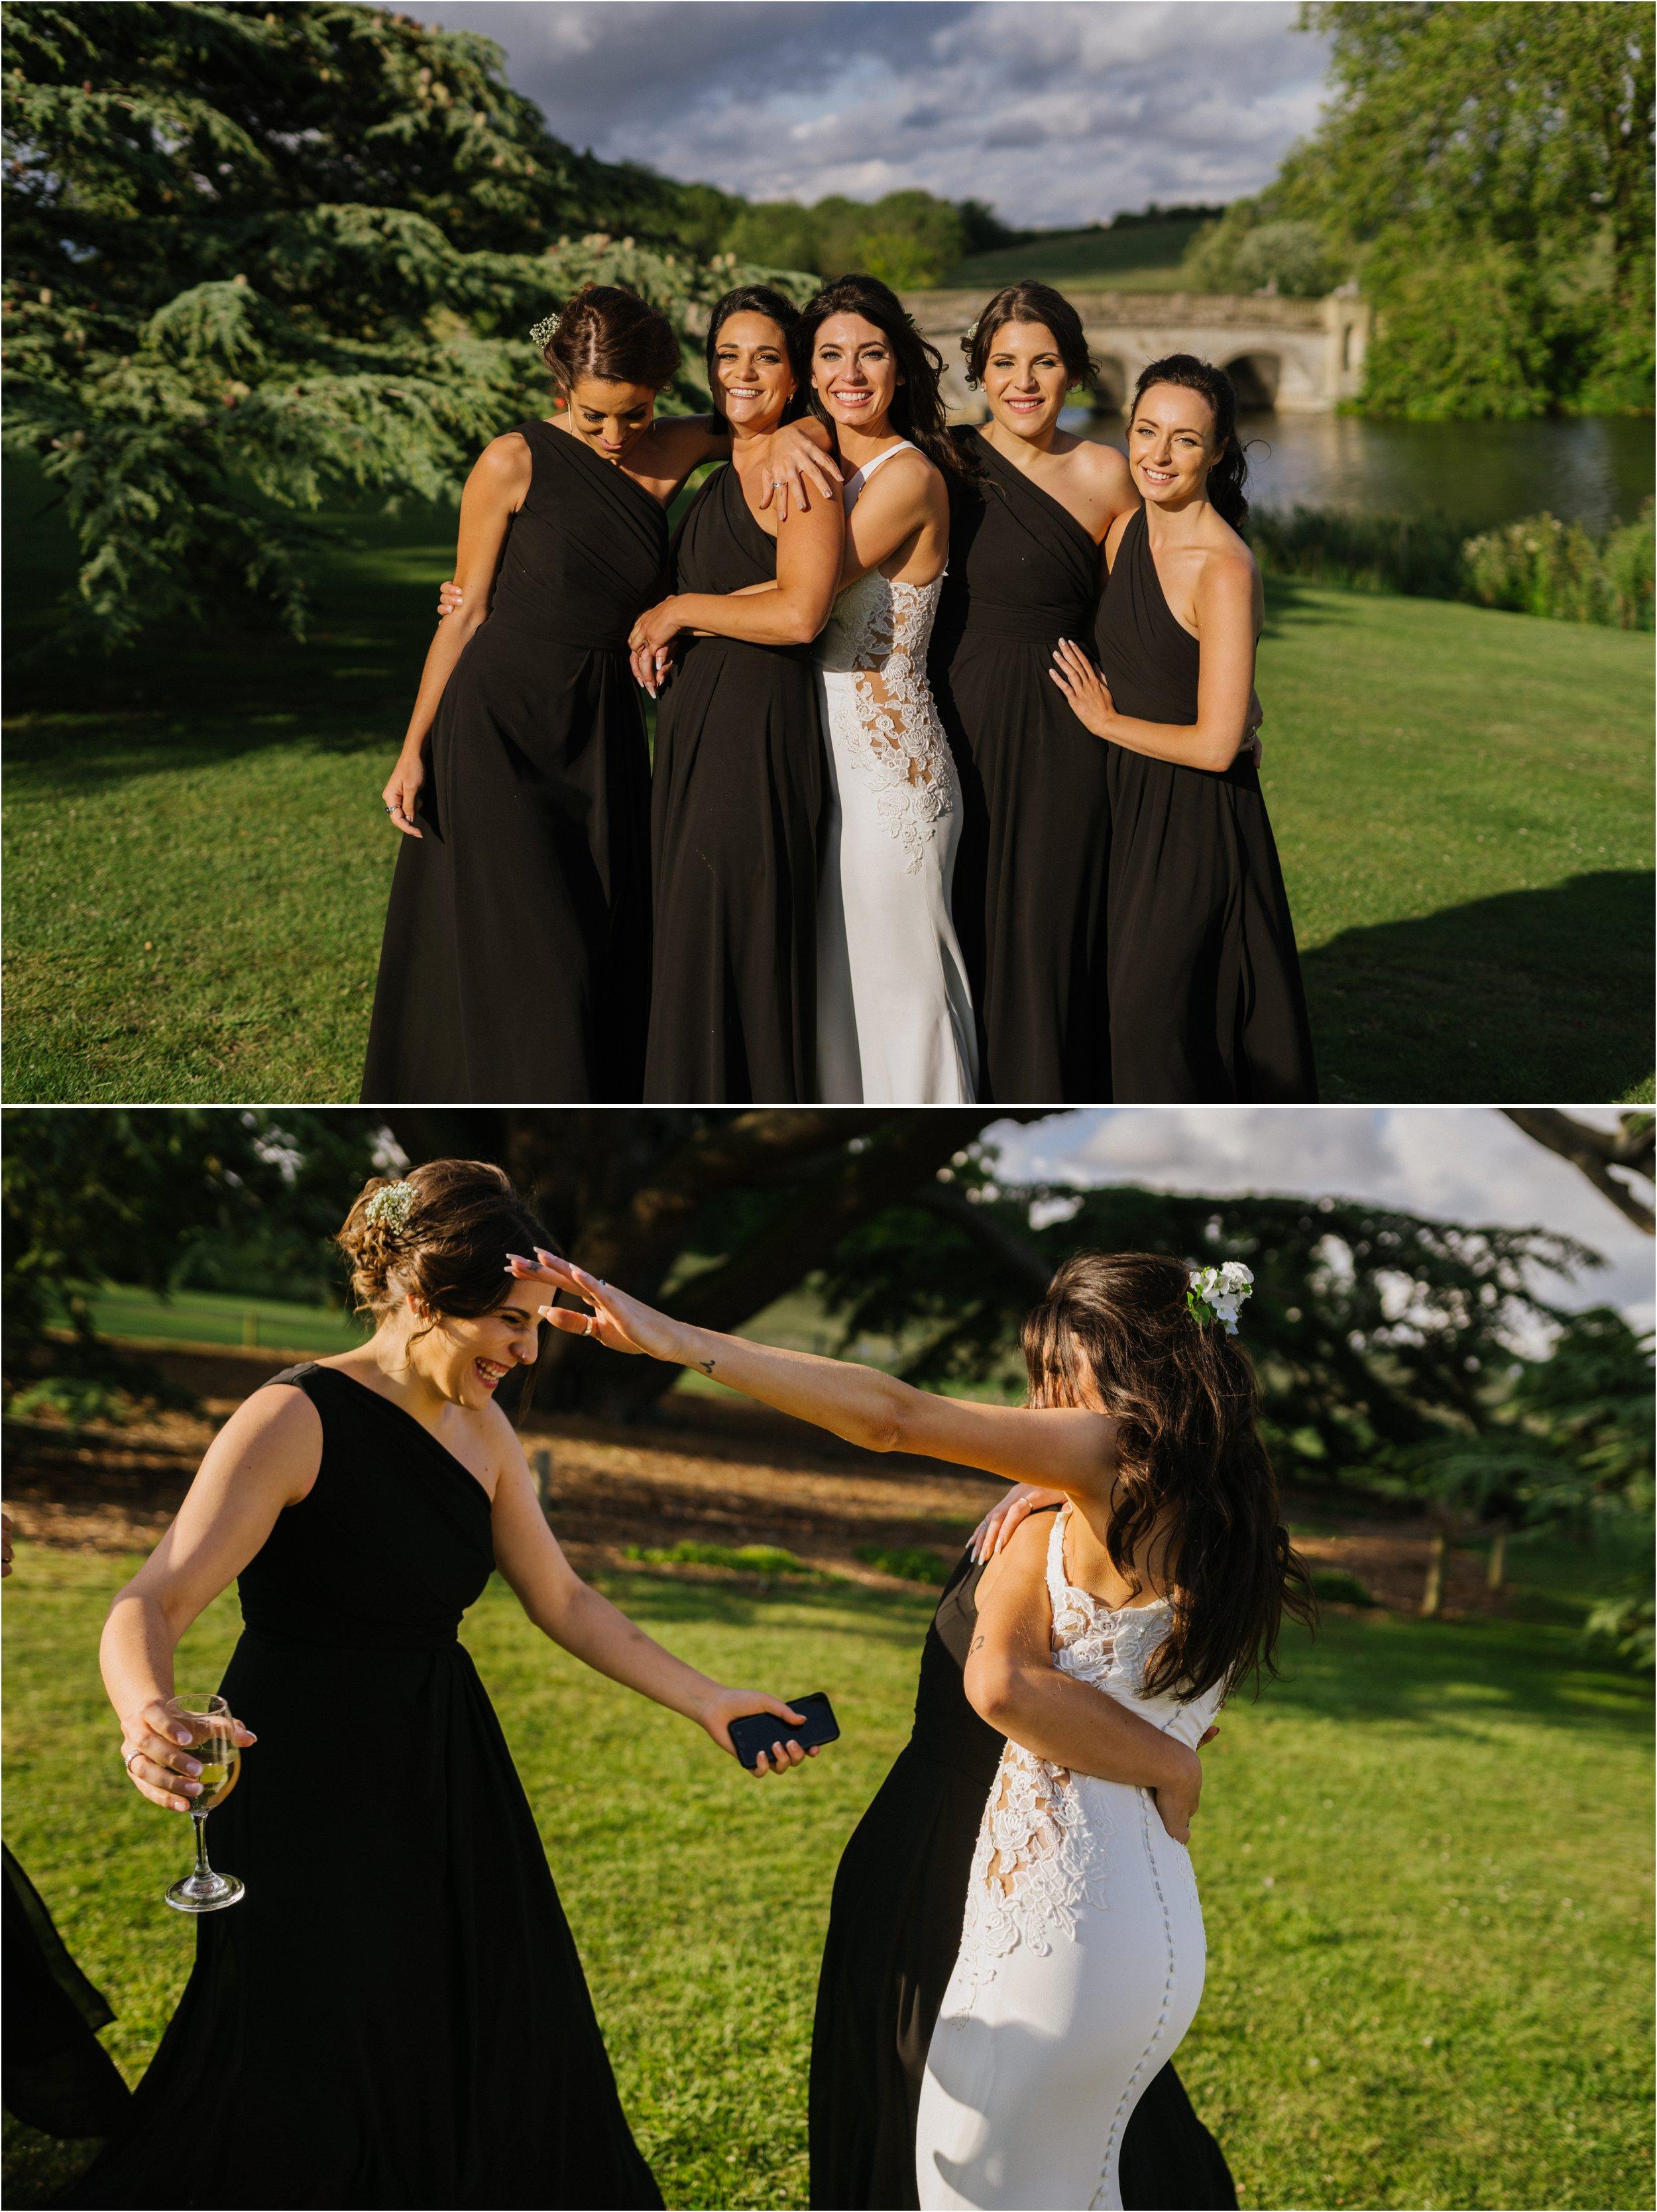 Compton Verney wedding photography_0133.jpg